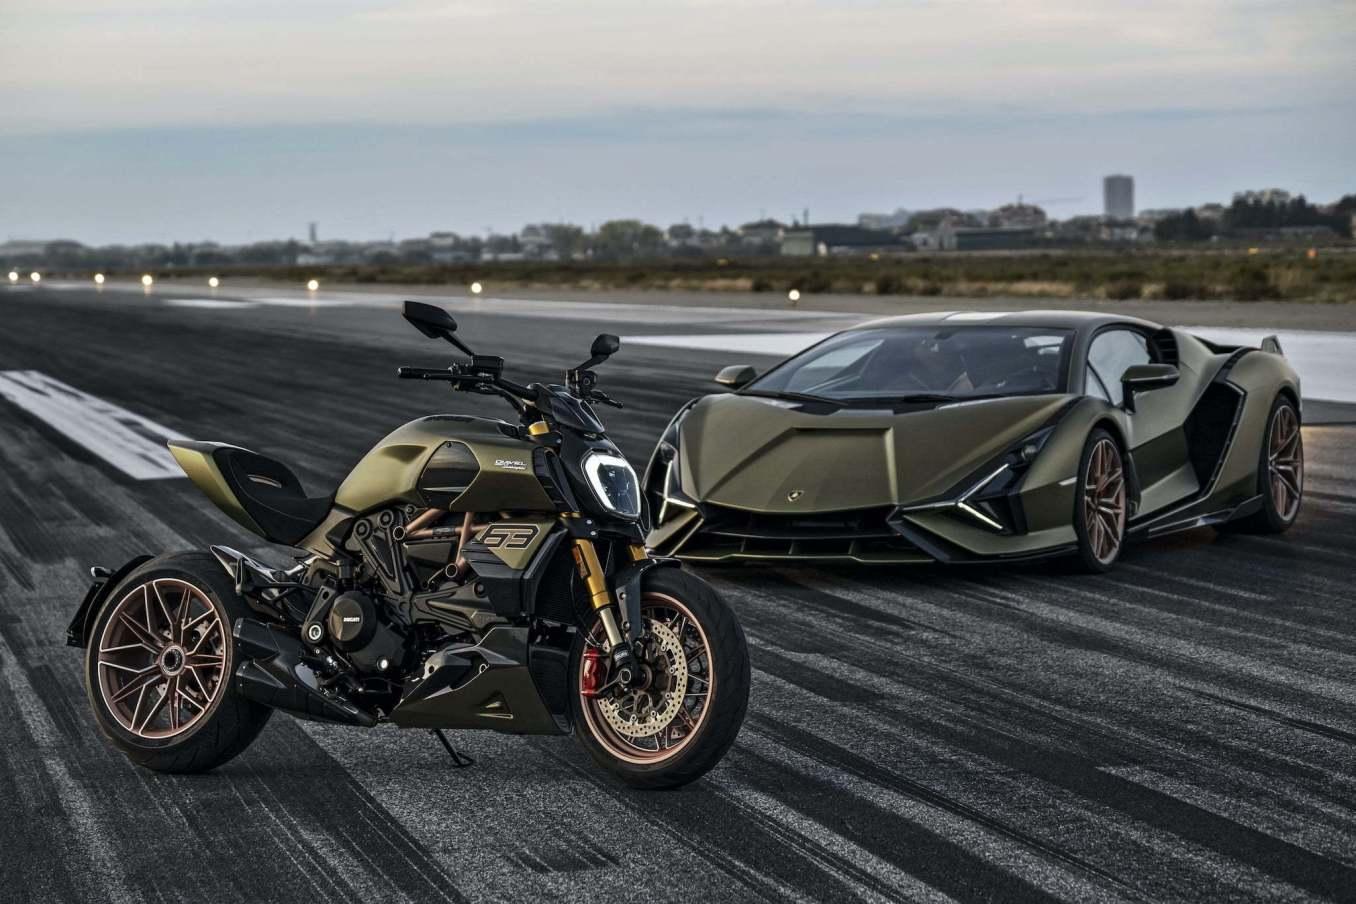 Ducati Diavel 1260 Lamborghini 2 | MV Agusta Superveloce Alpine 2020 : le mariage Franco-Italien !